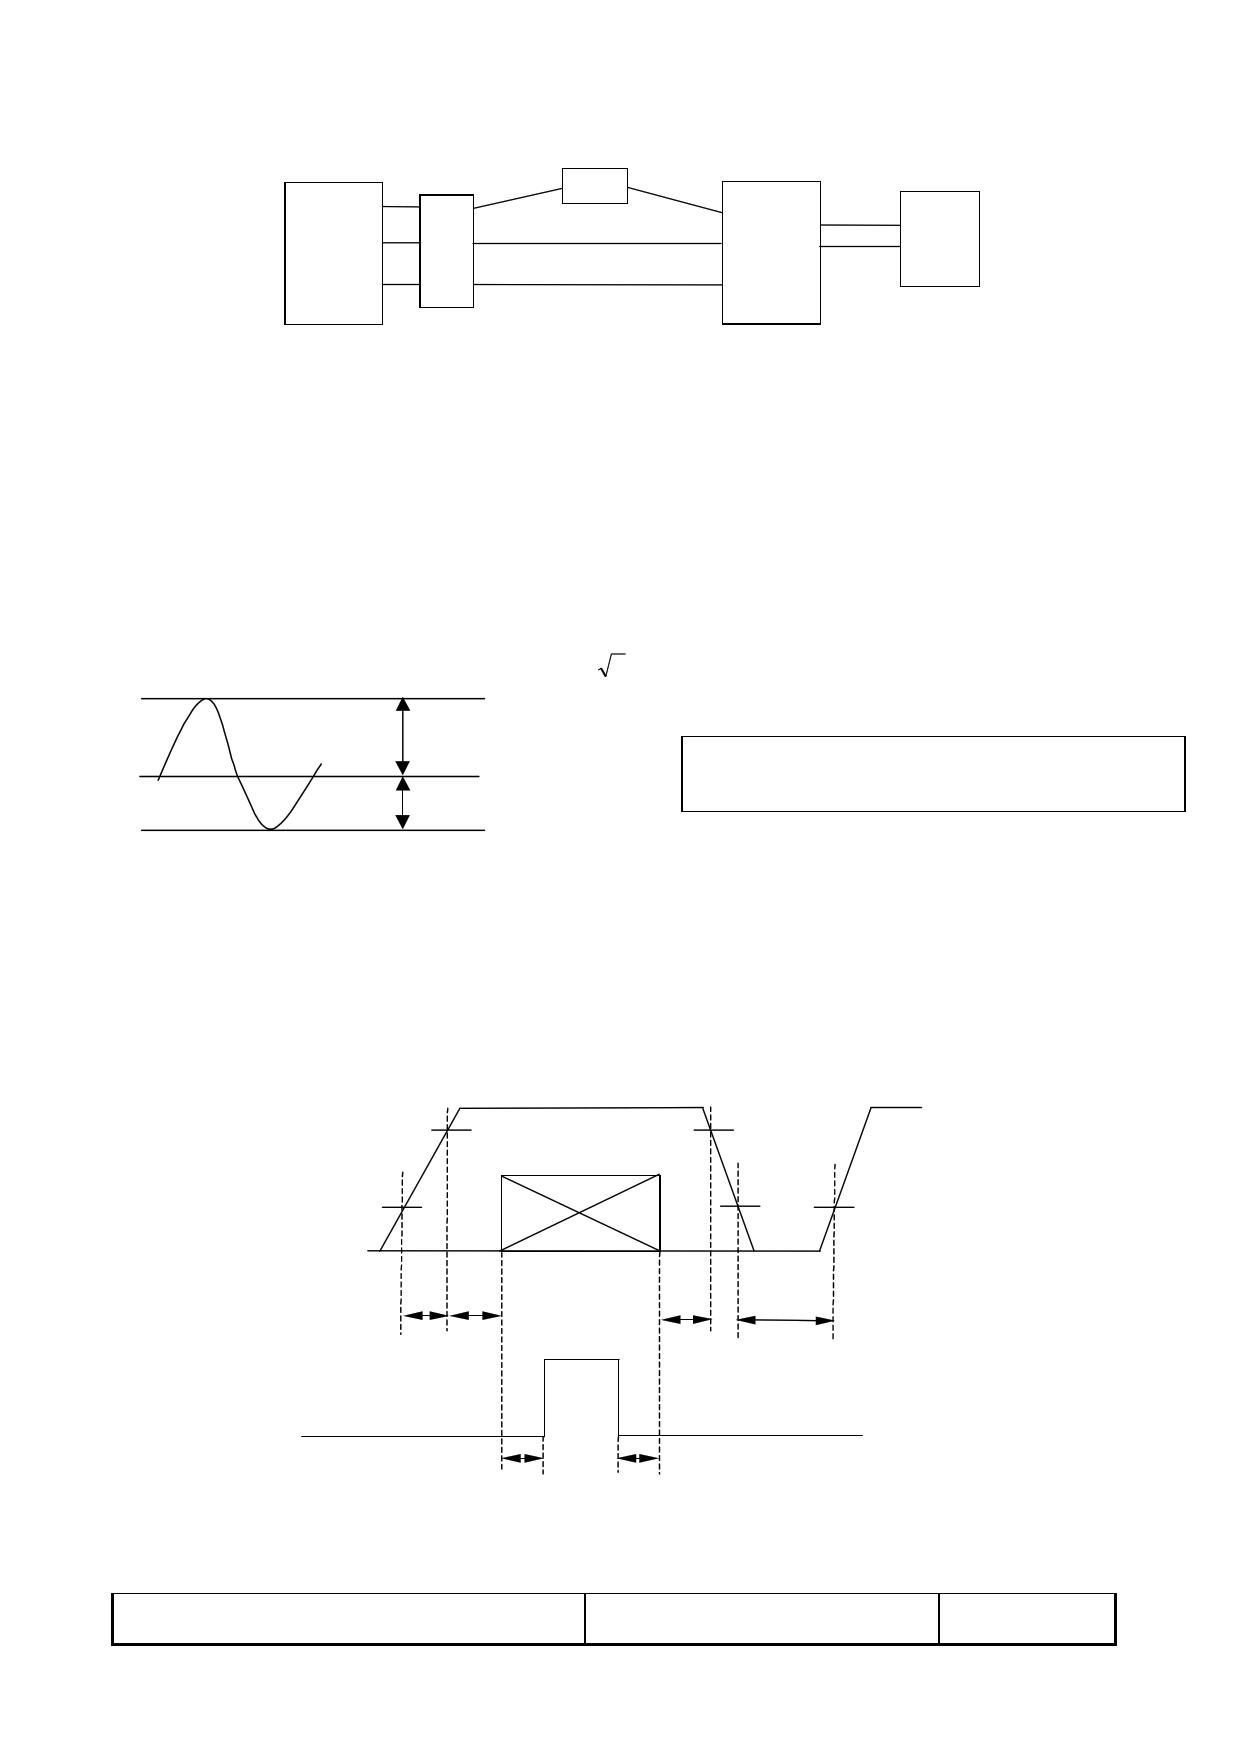 T-51512D121J-FW-A-AC pdf